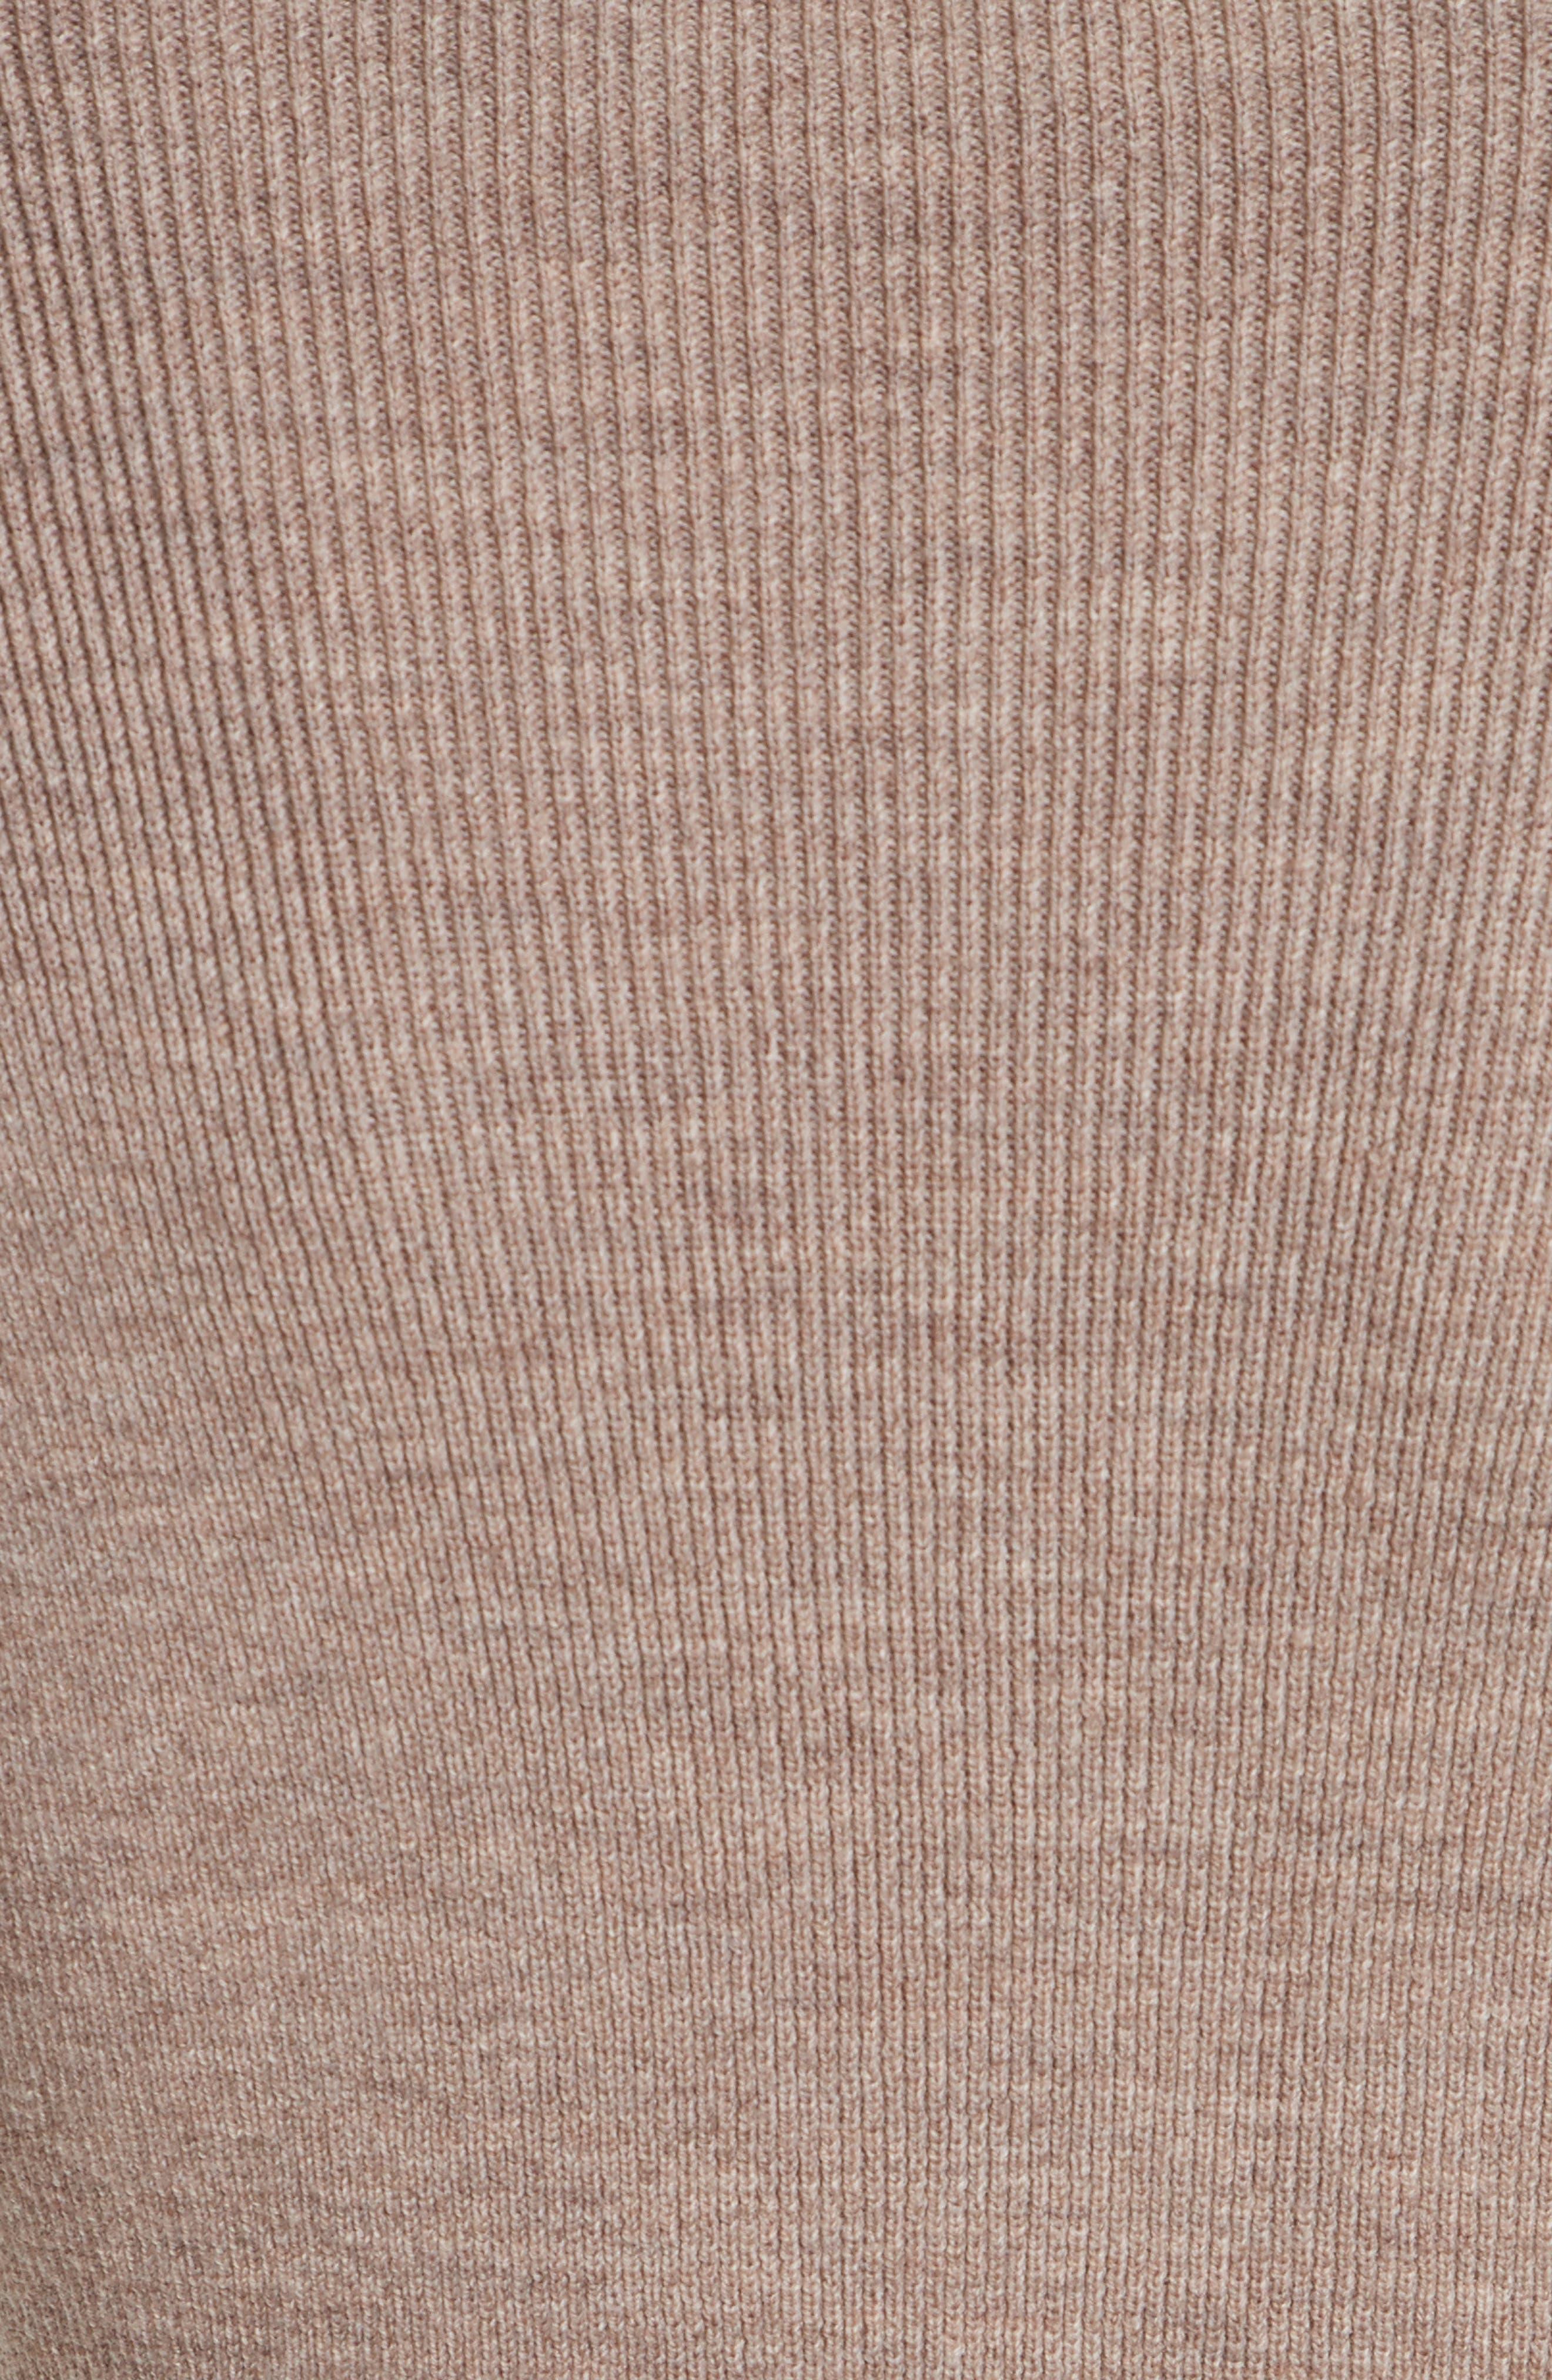 Mock Neck Sweater,                             Alternate thumbnail 5, color,                             260